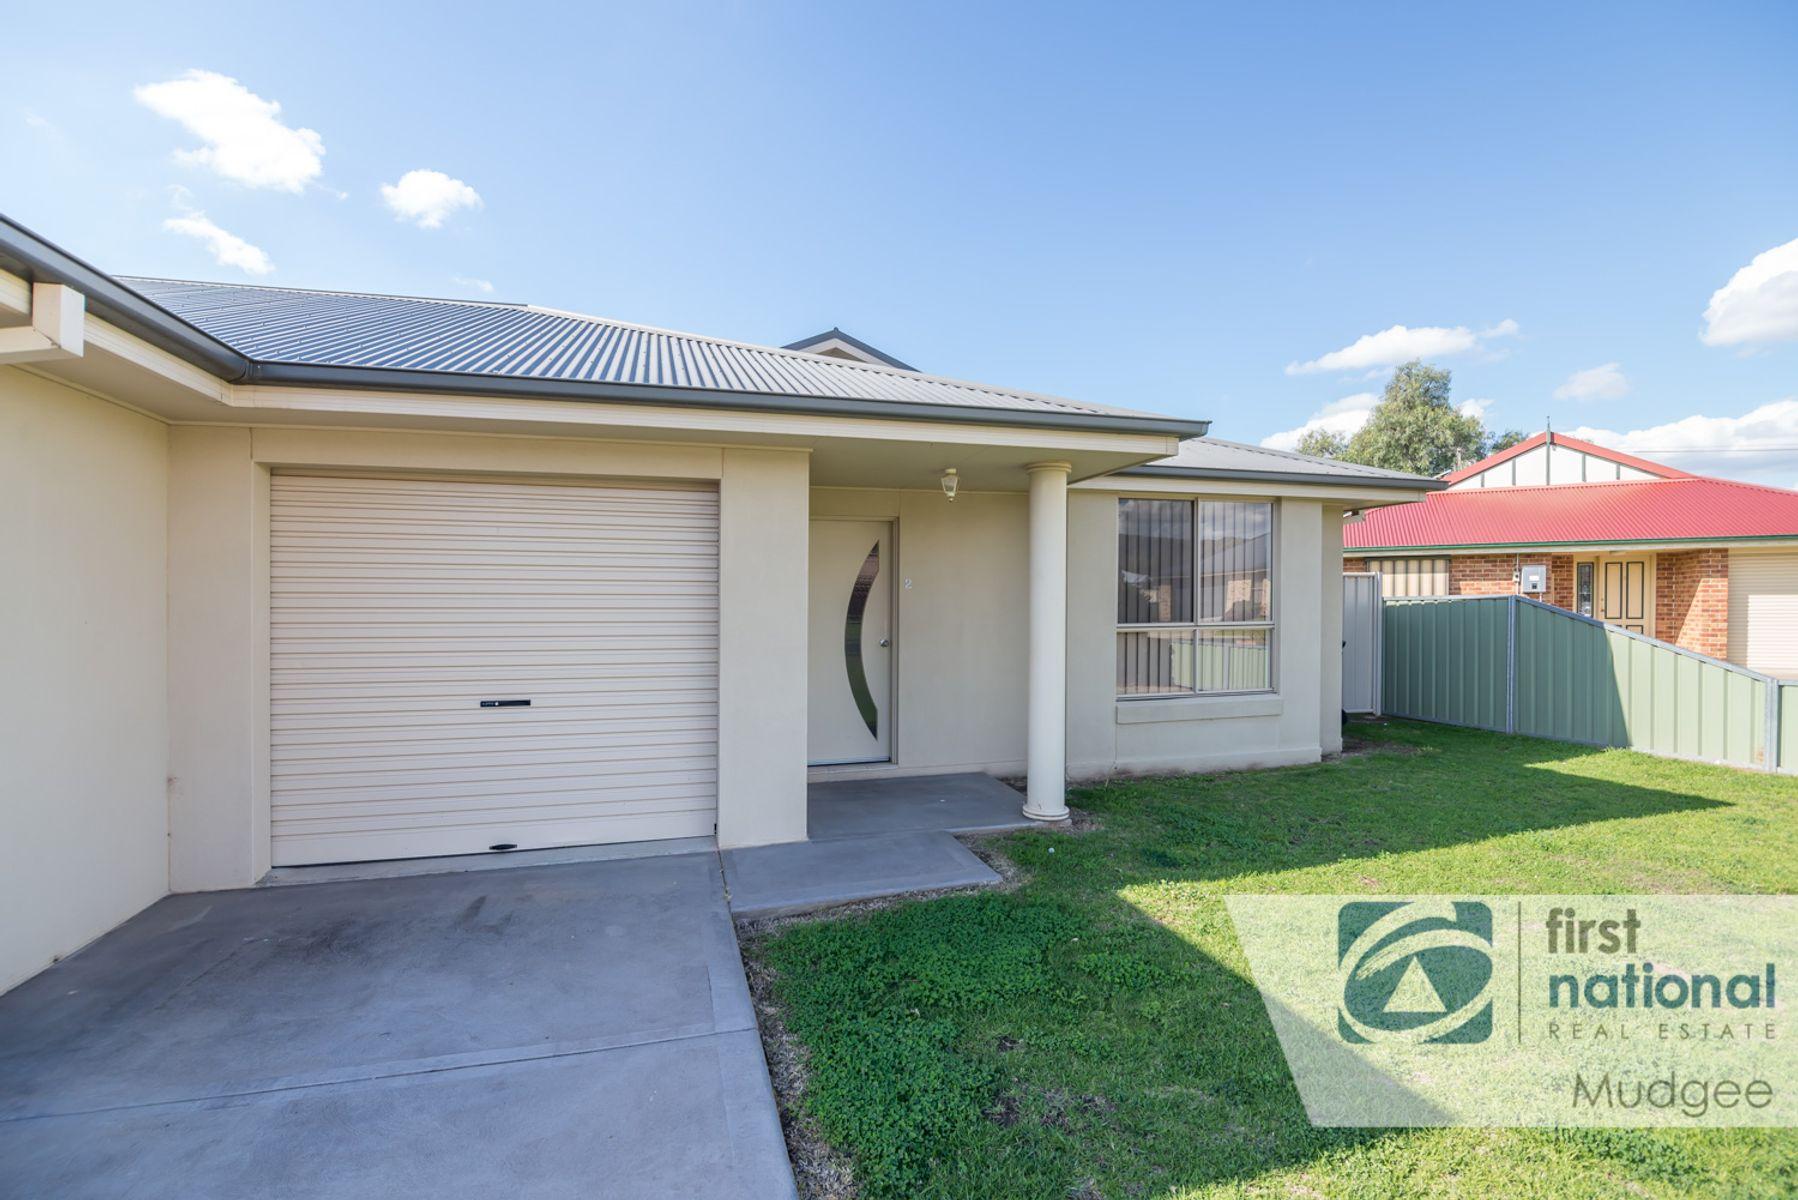 2/5 Thomas Clarke Place, Mudgee, NSW 2850